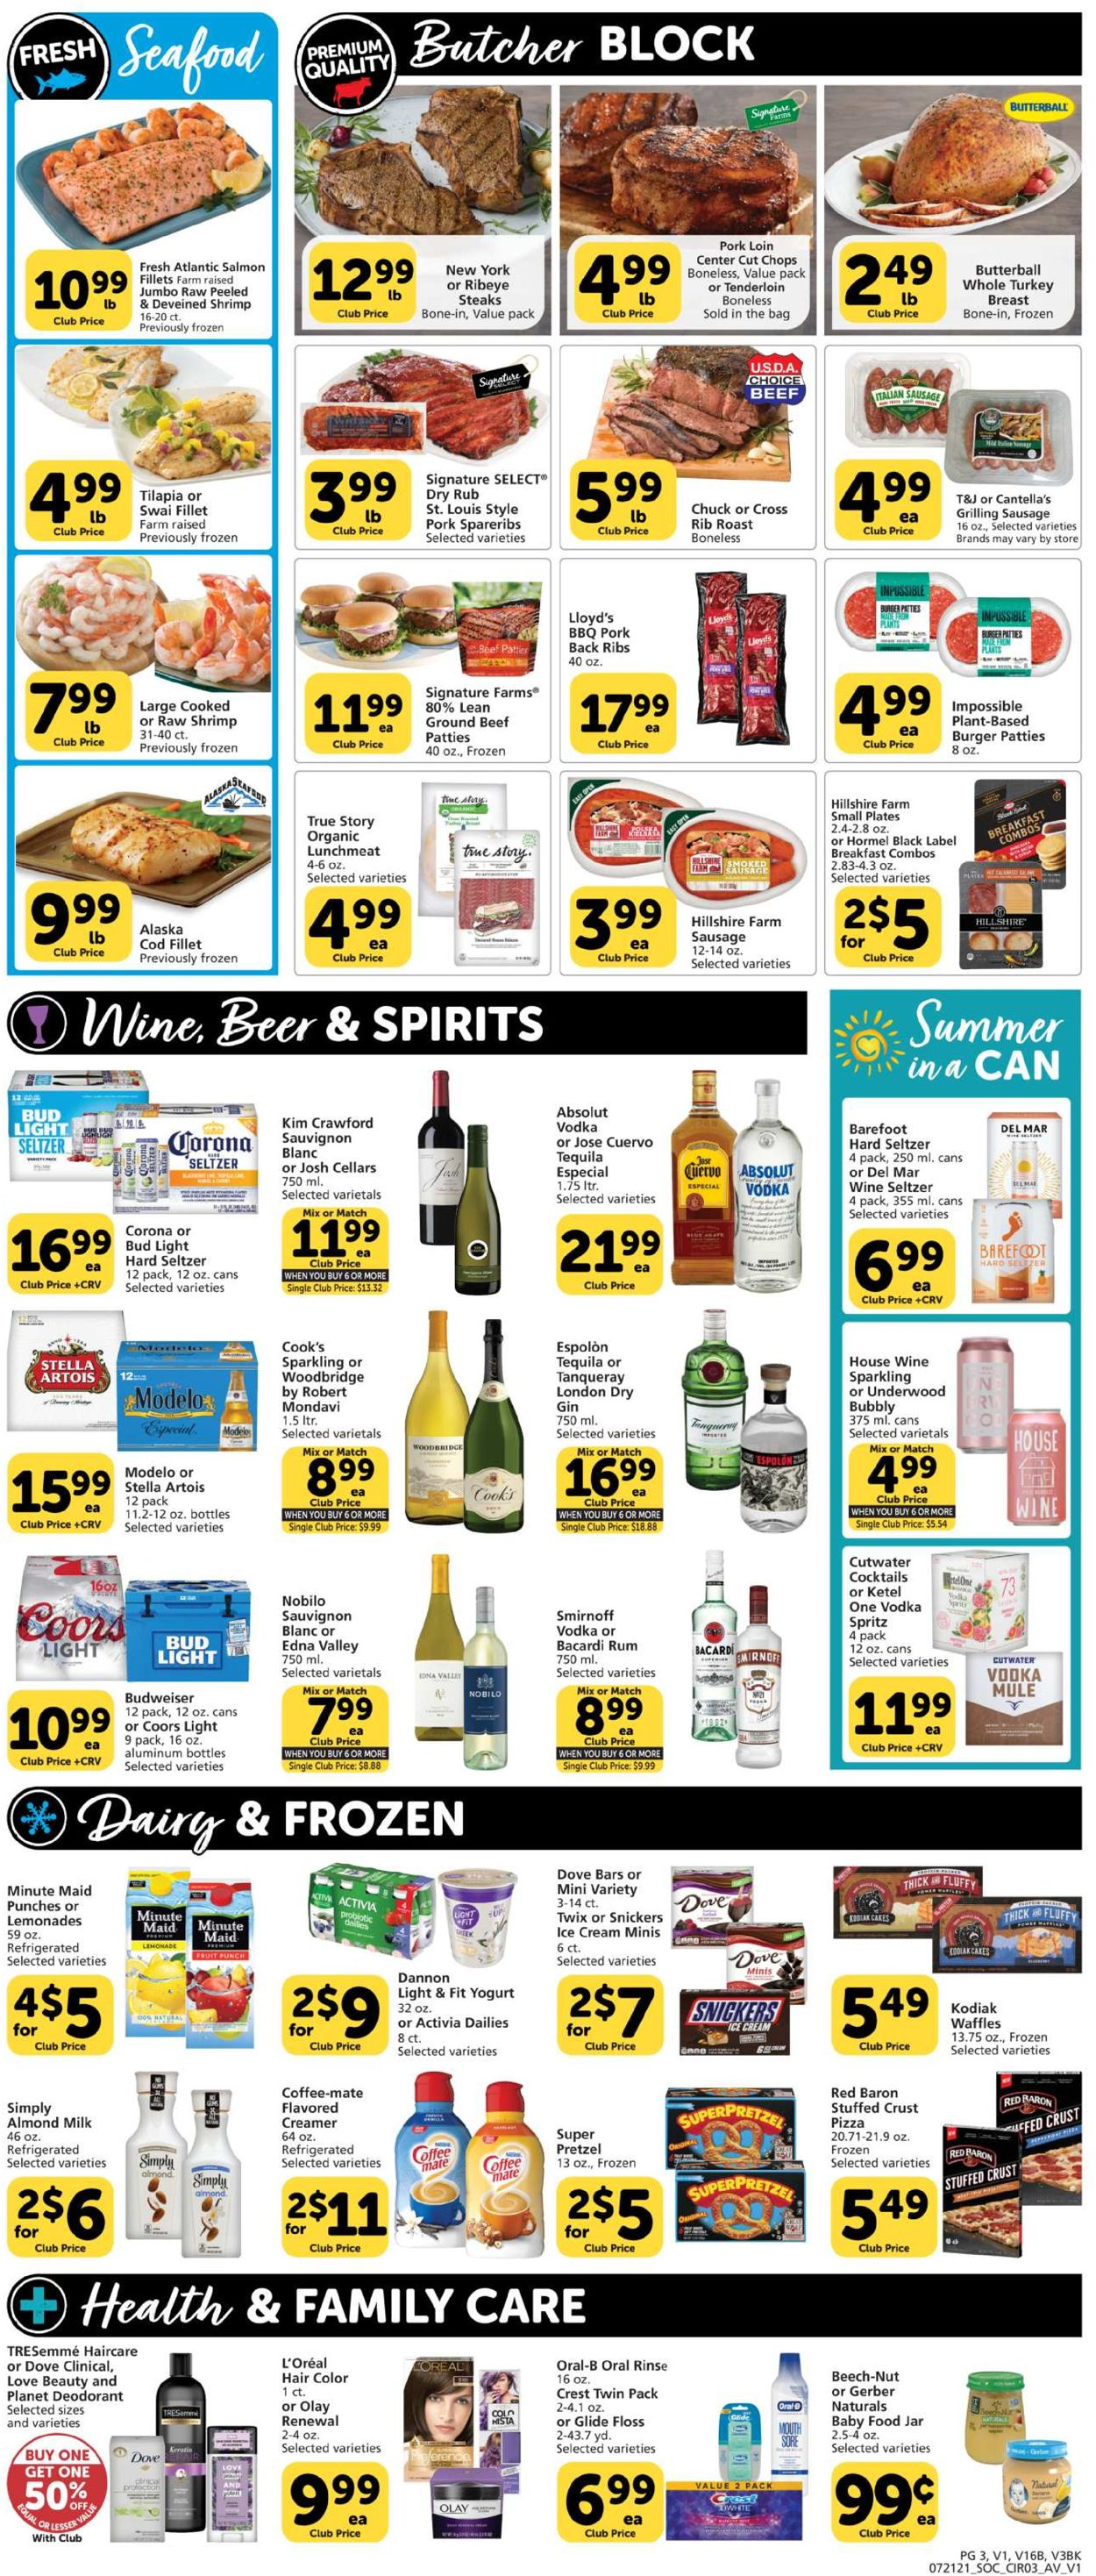 Vons Weekly Ad Circular - valid 07/21-07/28/2021 (Page 3)